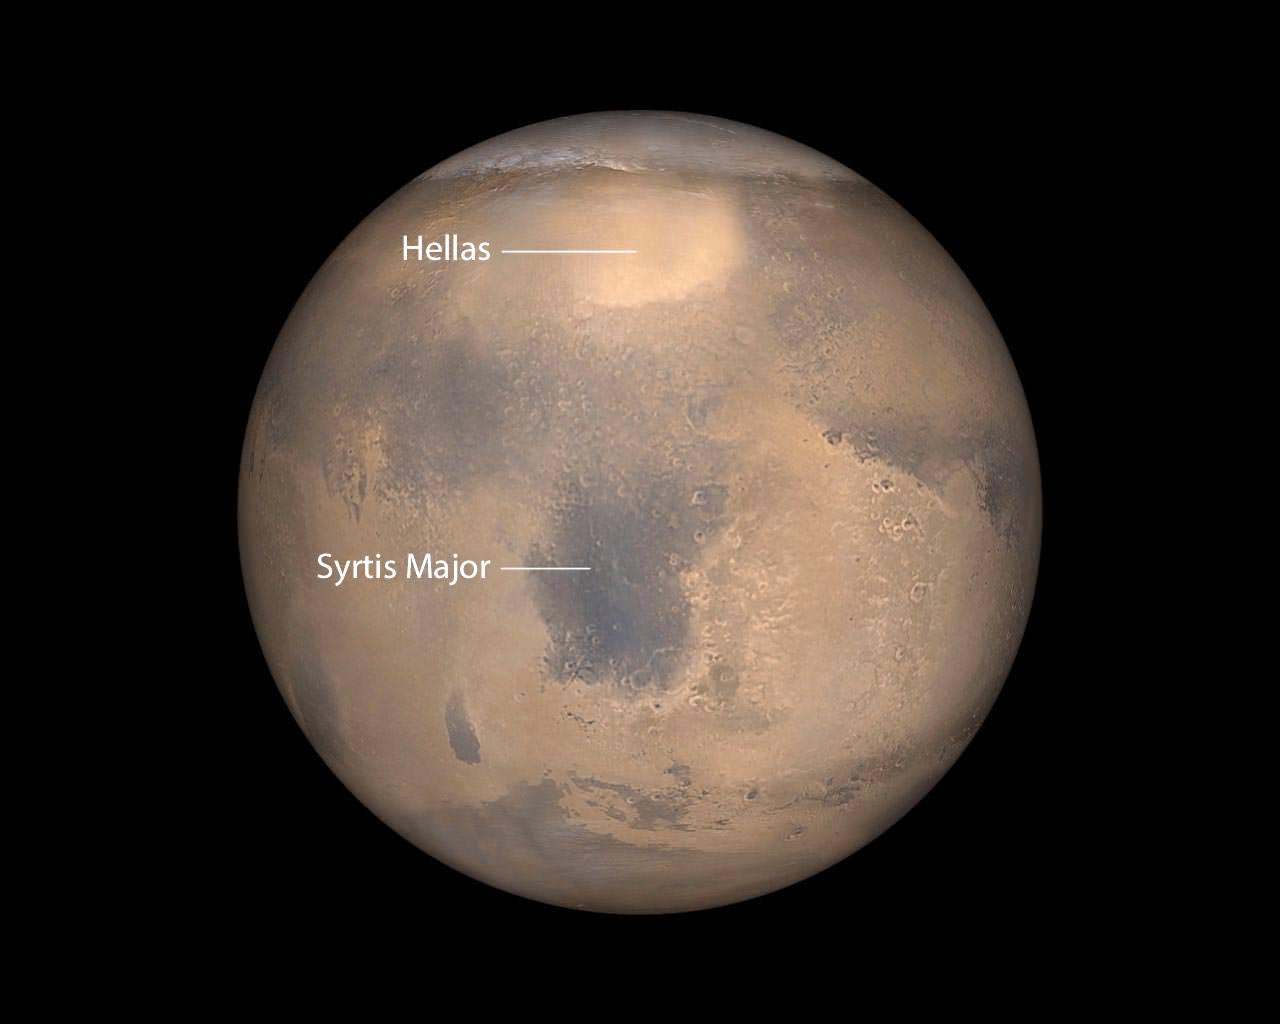 Maratona planetária. Hellas-NASA_JPL_MalinSpaceScienceSystems_anno_edited-1